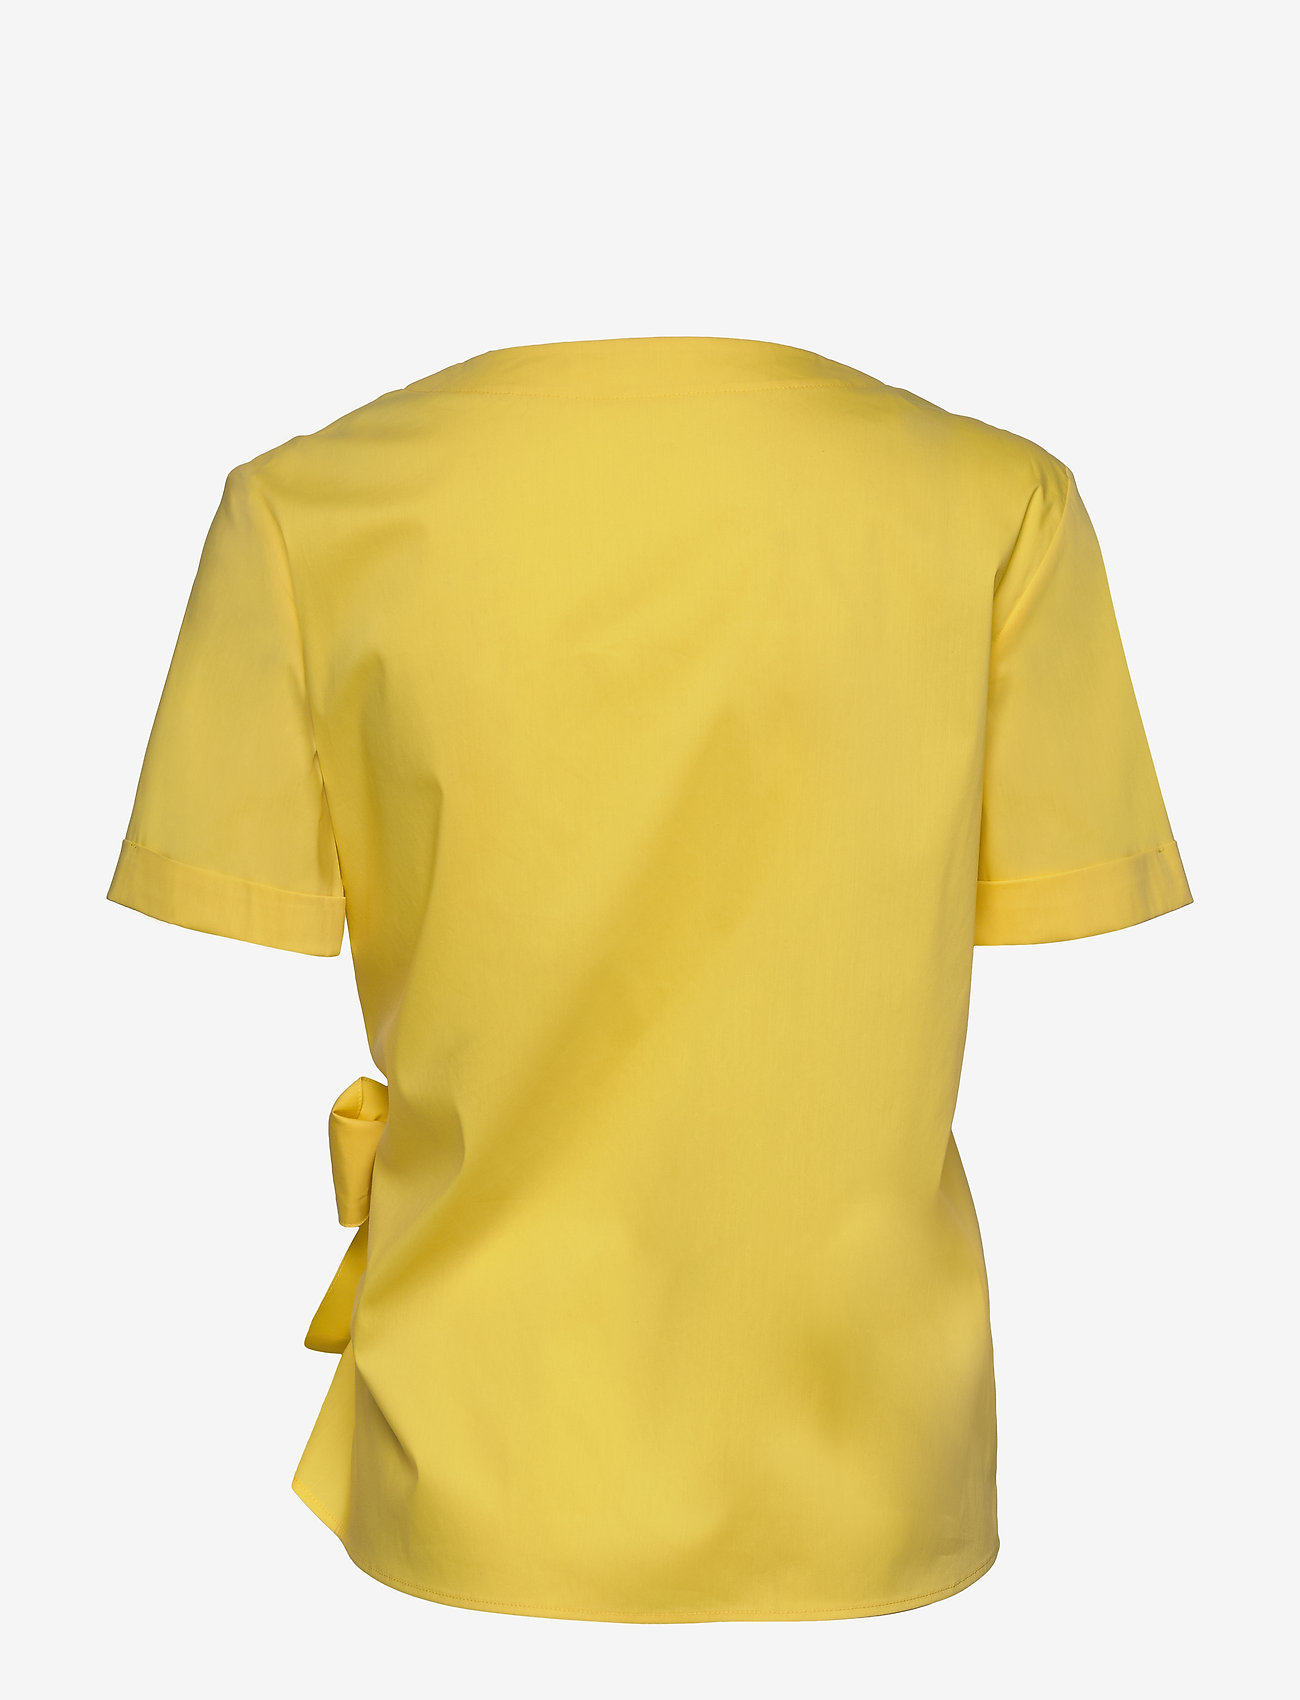 Gerry Weber Edition Blouse Short-sleeve - Blouses & Shirts